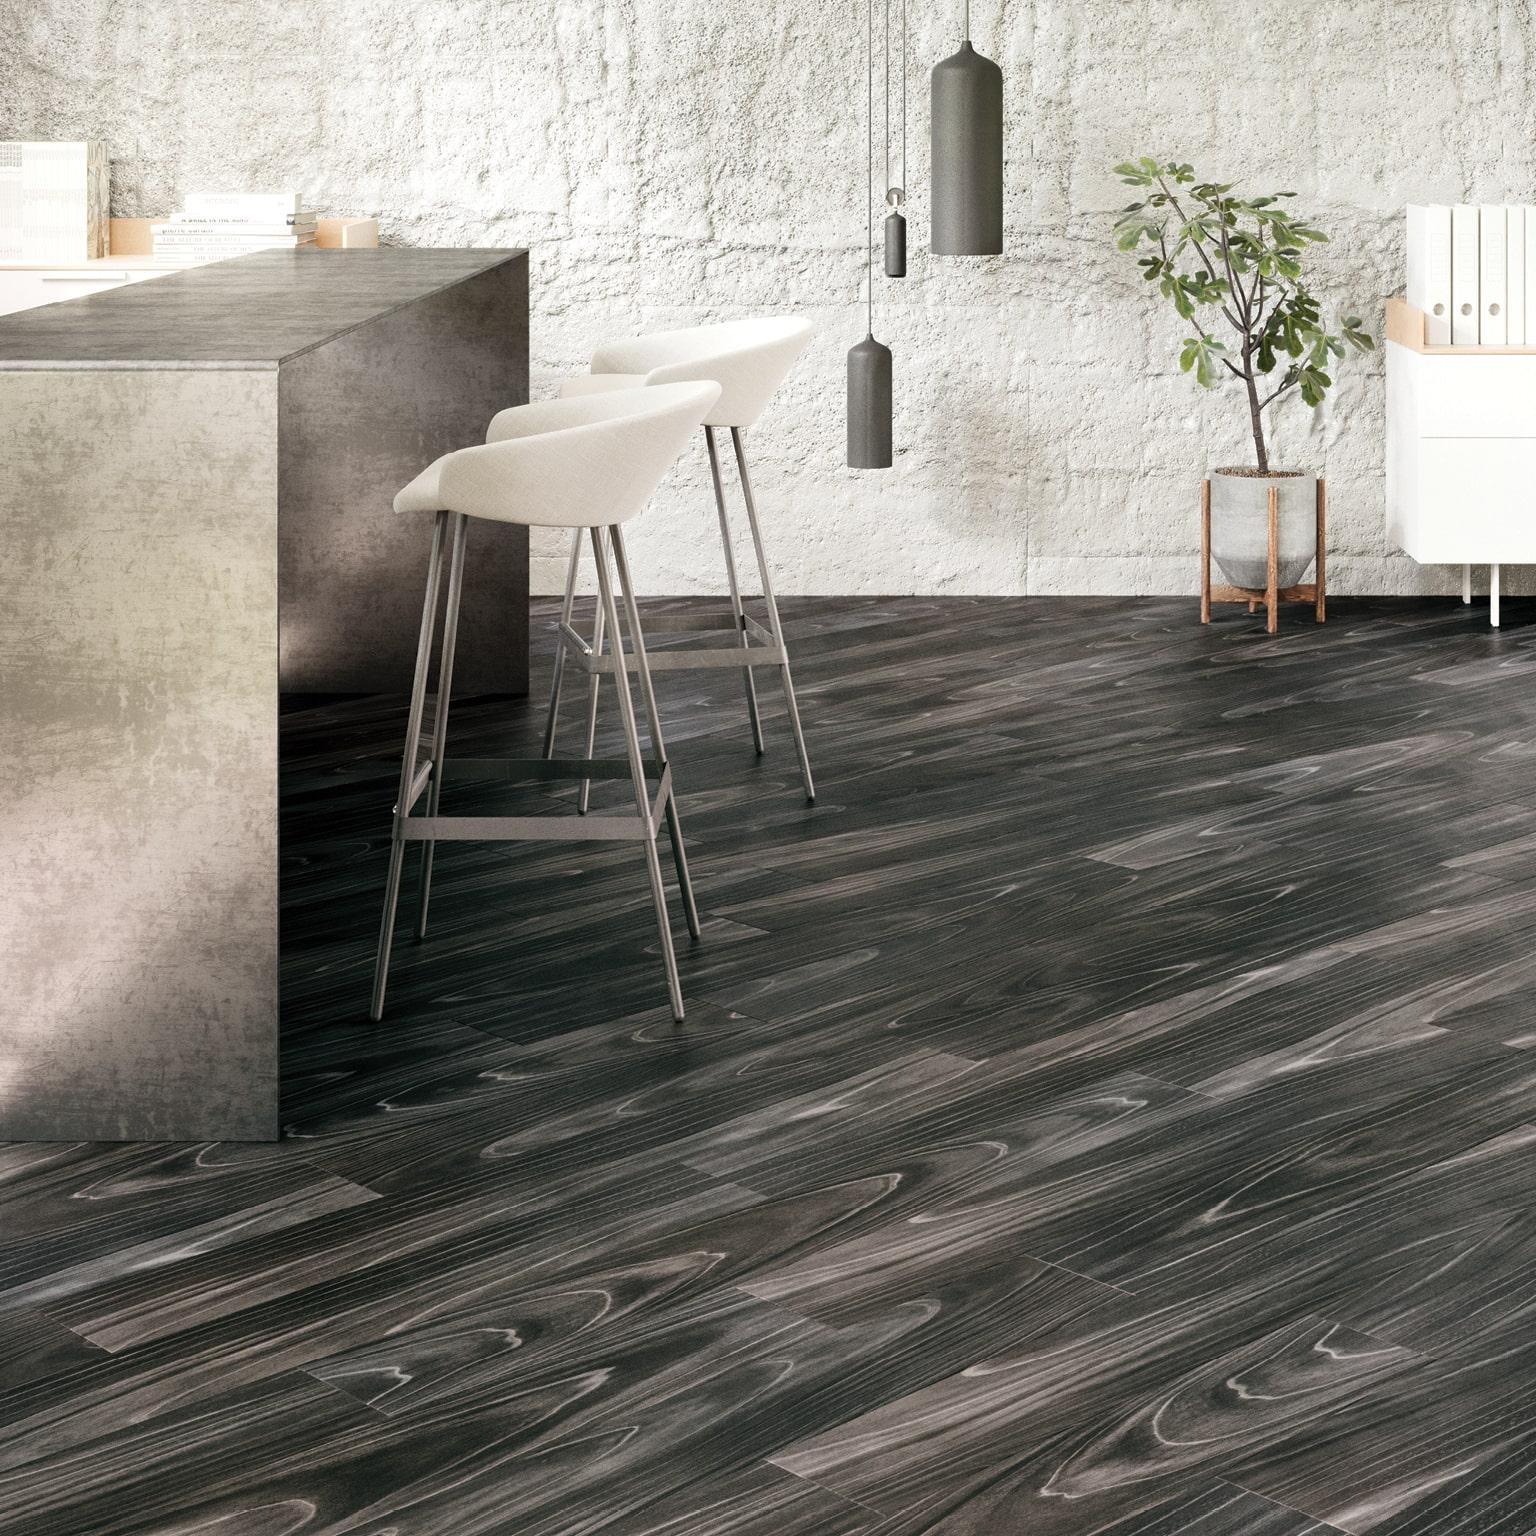 Mannington Commercial LVT Dark Wood Grain PortlandLVT_RoomScenes_1536x1536_0_02_Flume-Copperpot-min